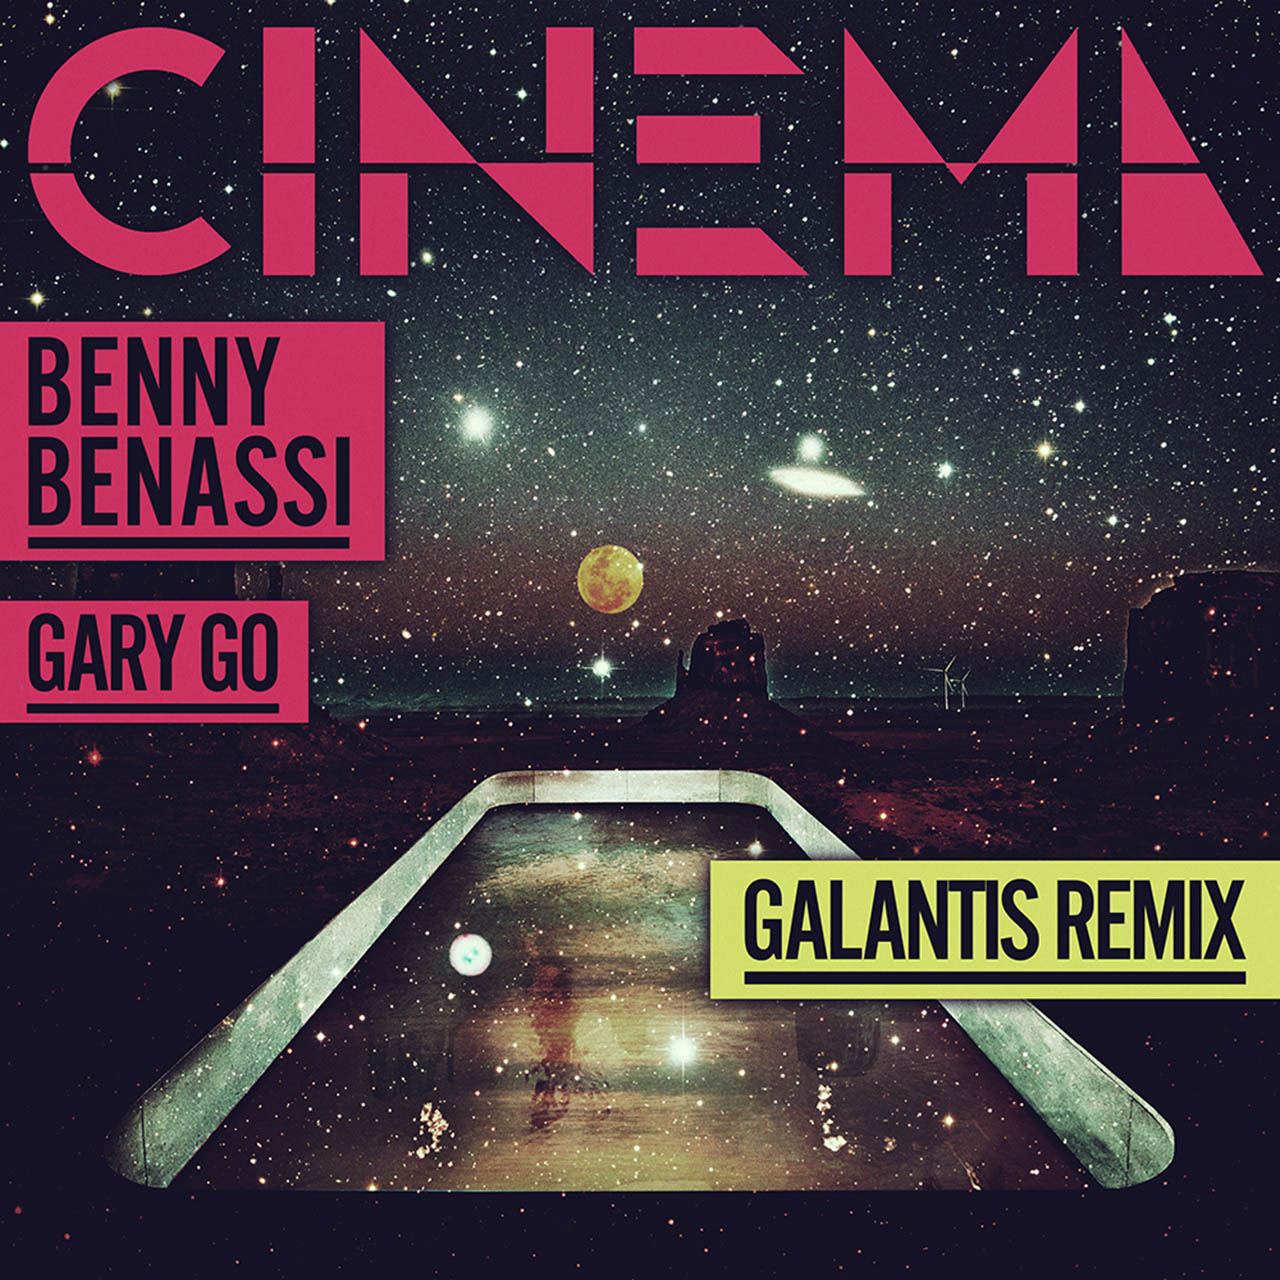 Benny-Benassi-Cinema-Galantis-Remix